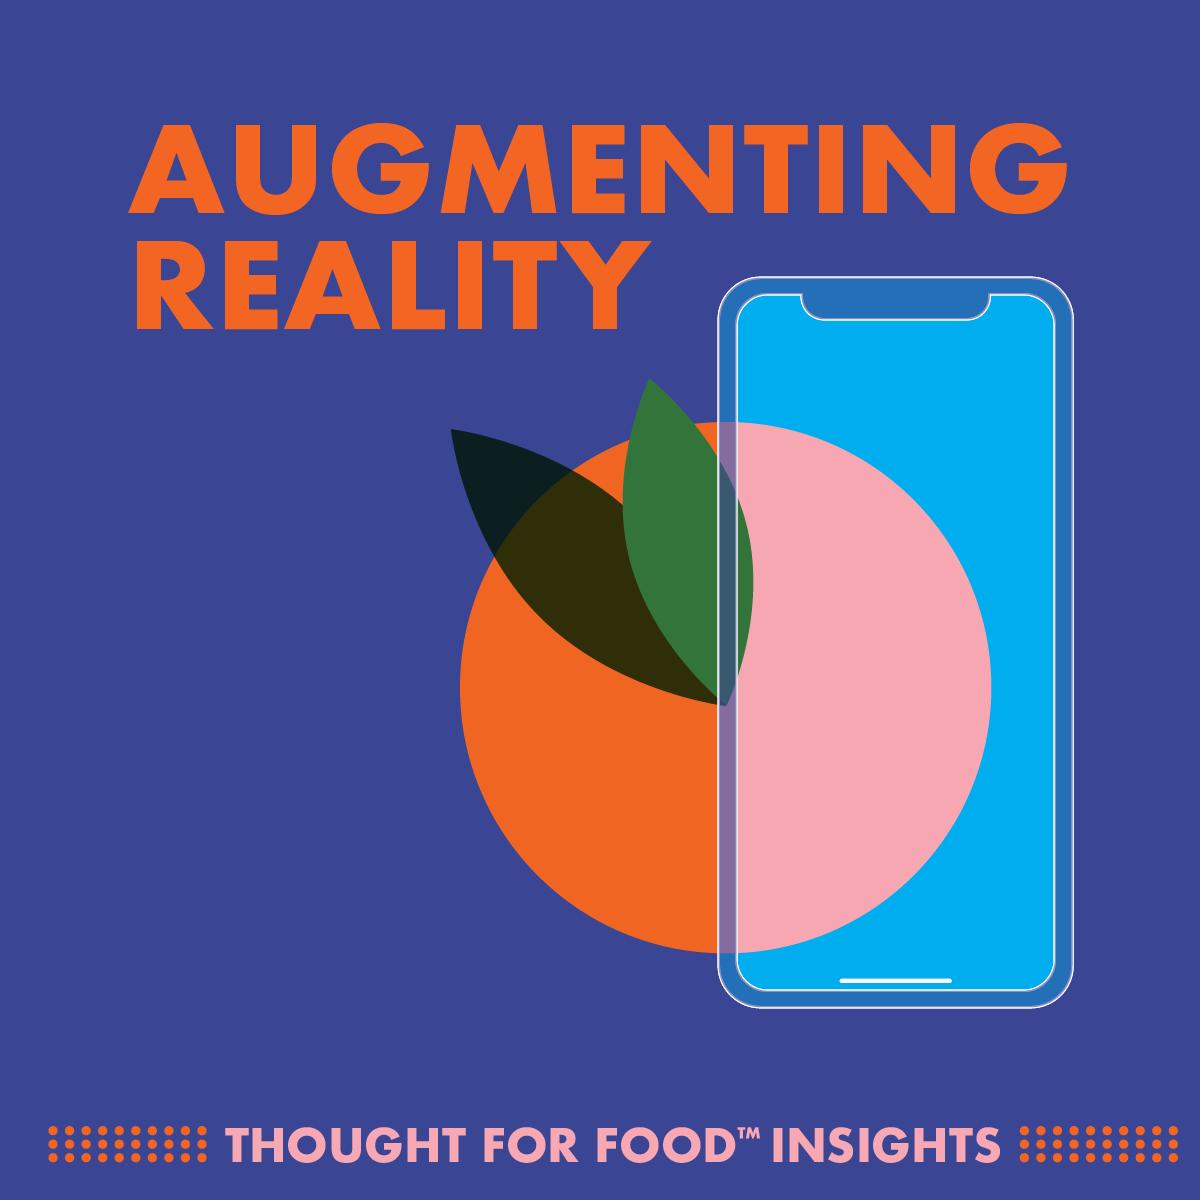 Augmenting Reality illustration